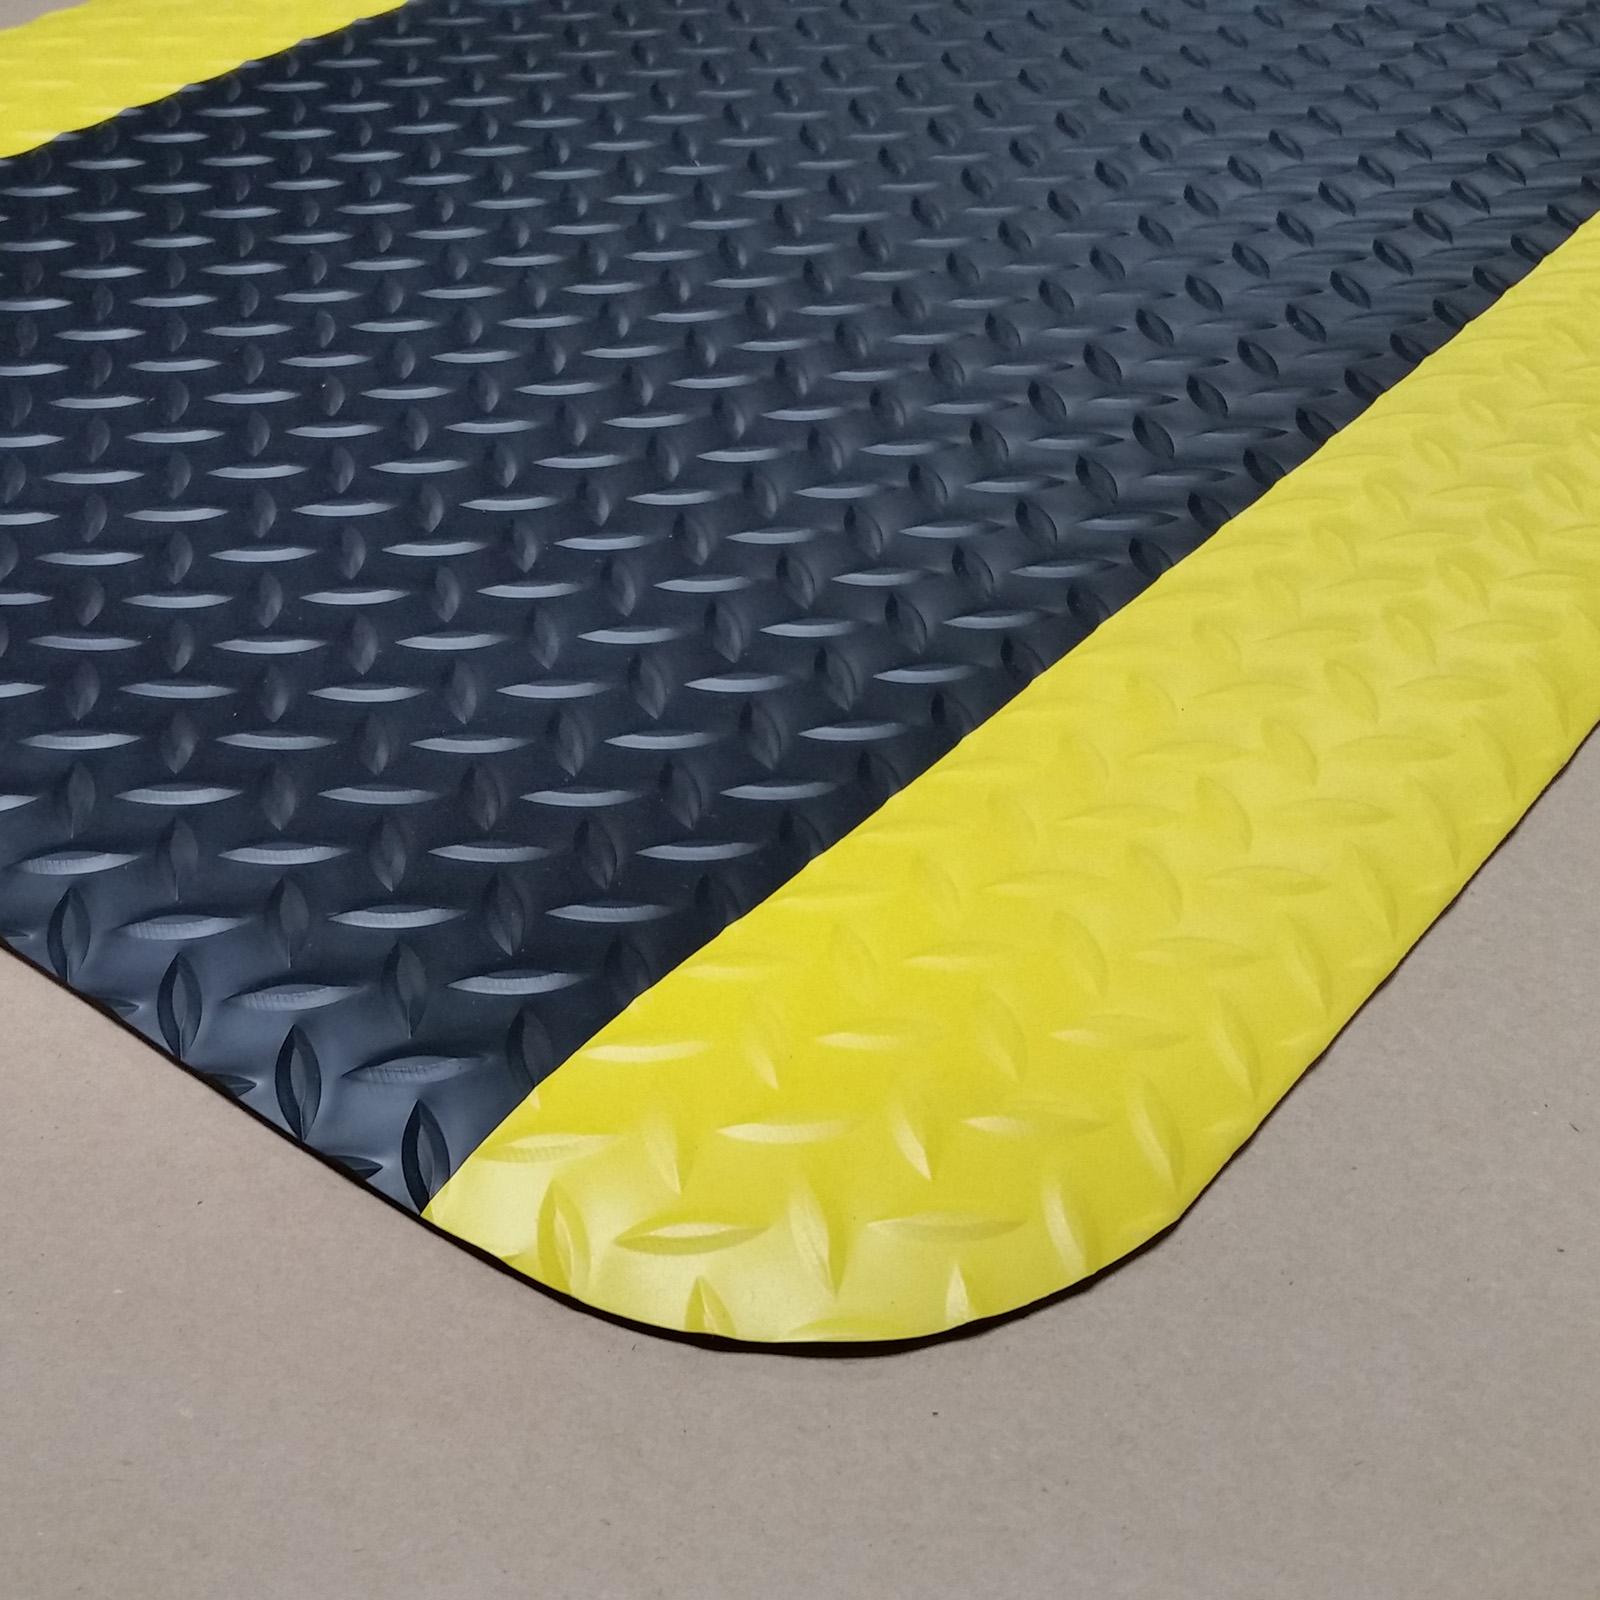 Cactus Mat 1053R-4 floor mat, anti-fatigue